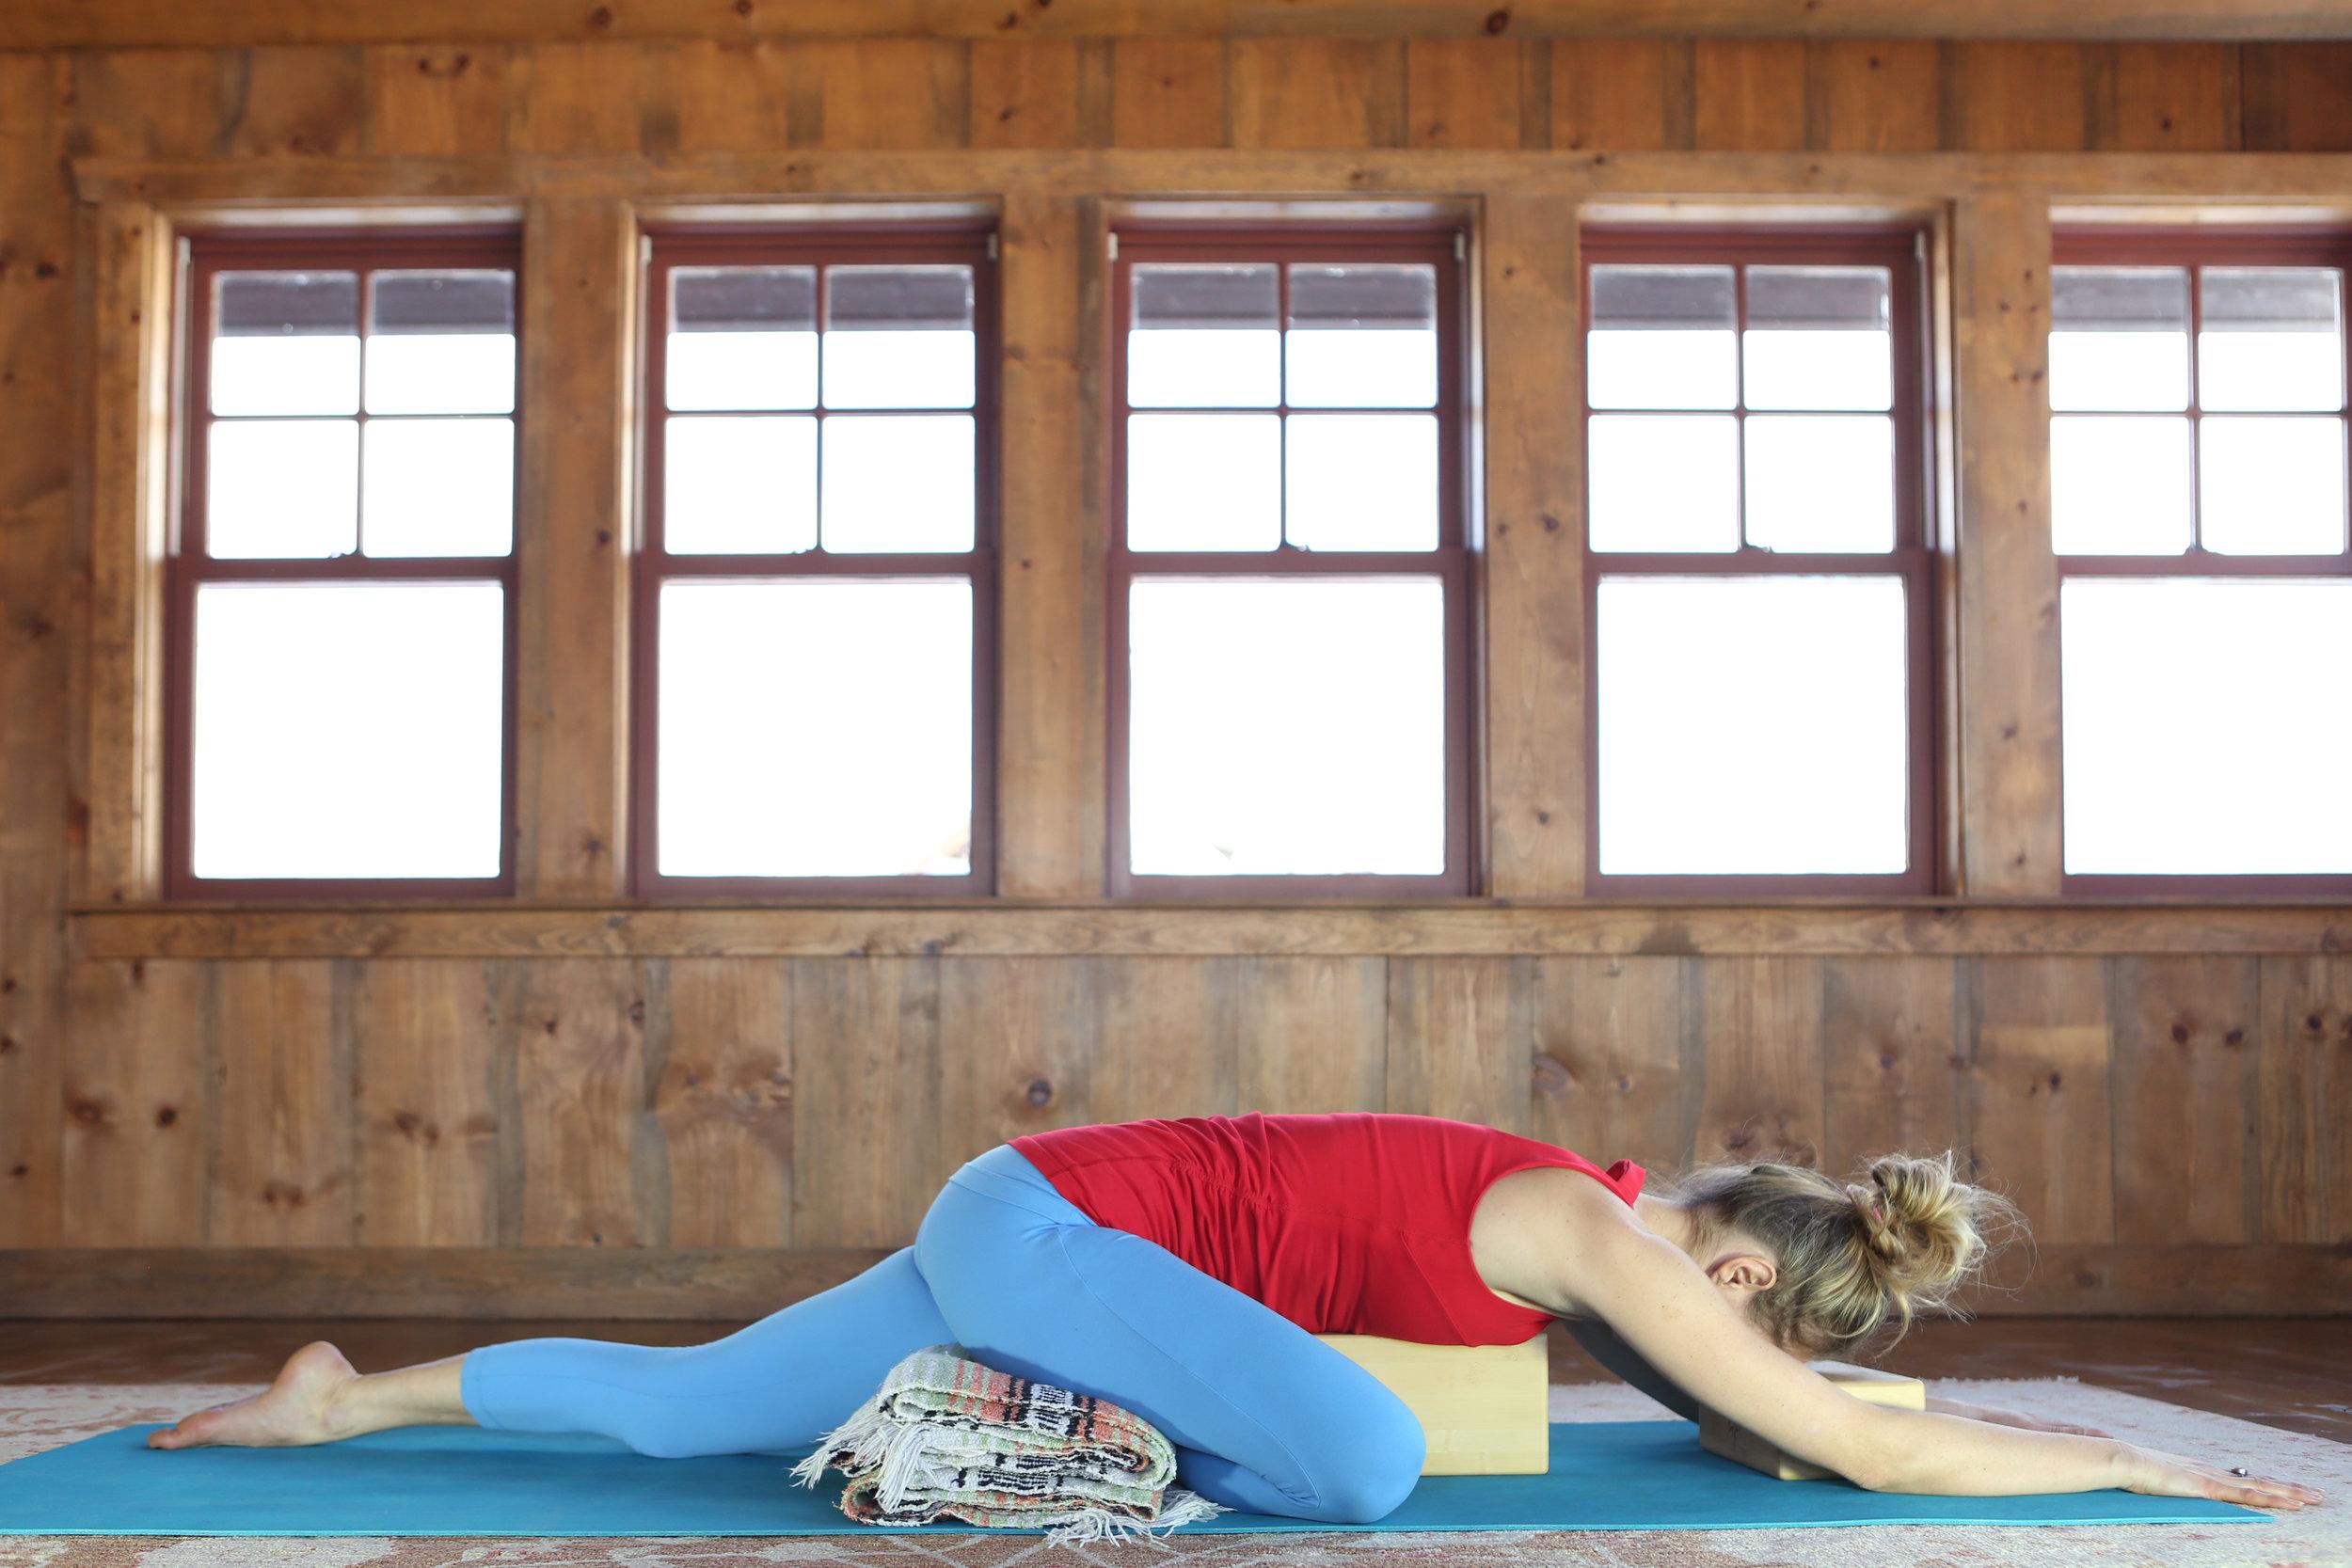 3 Restorative Poses to Optimize Organ Function - Yoga Journal